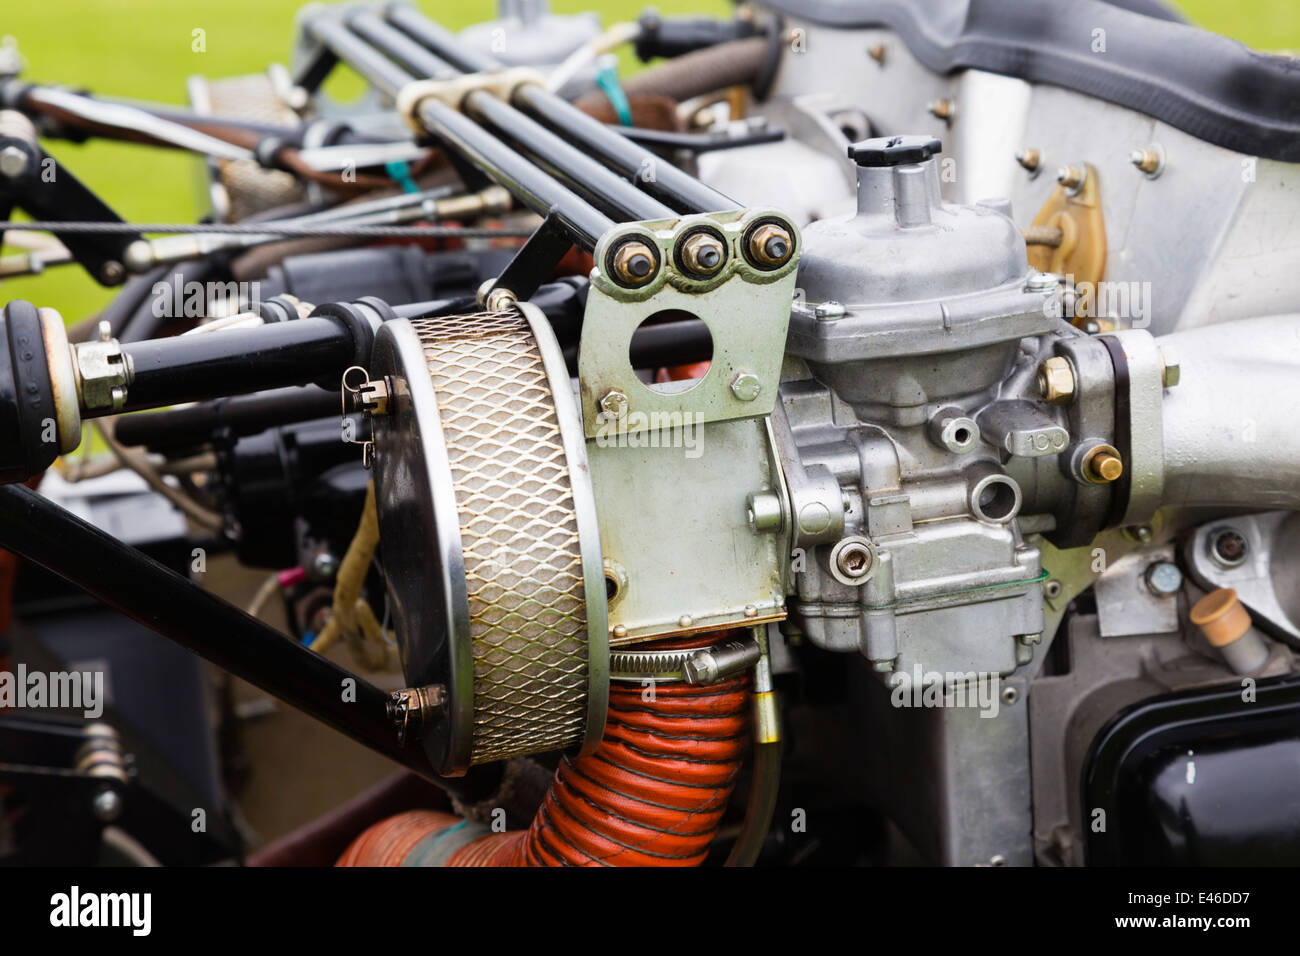 Grob 109b motor glider engine compartment Stock Photo